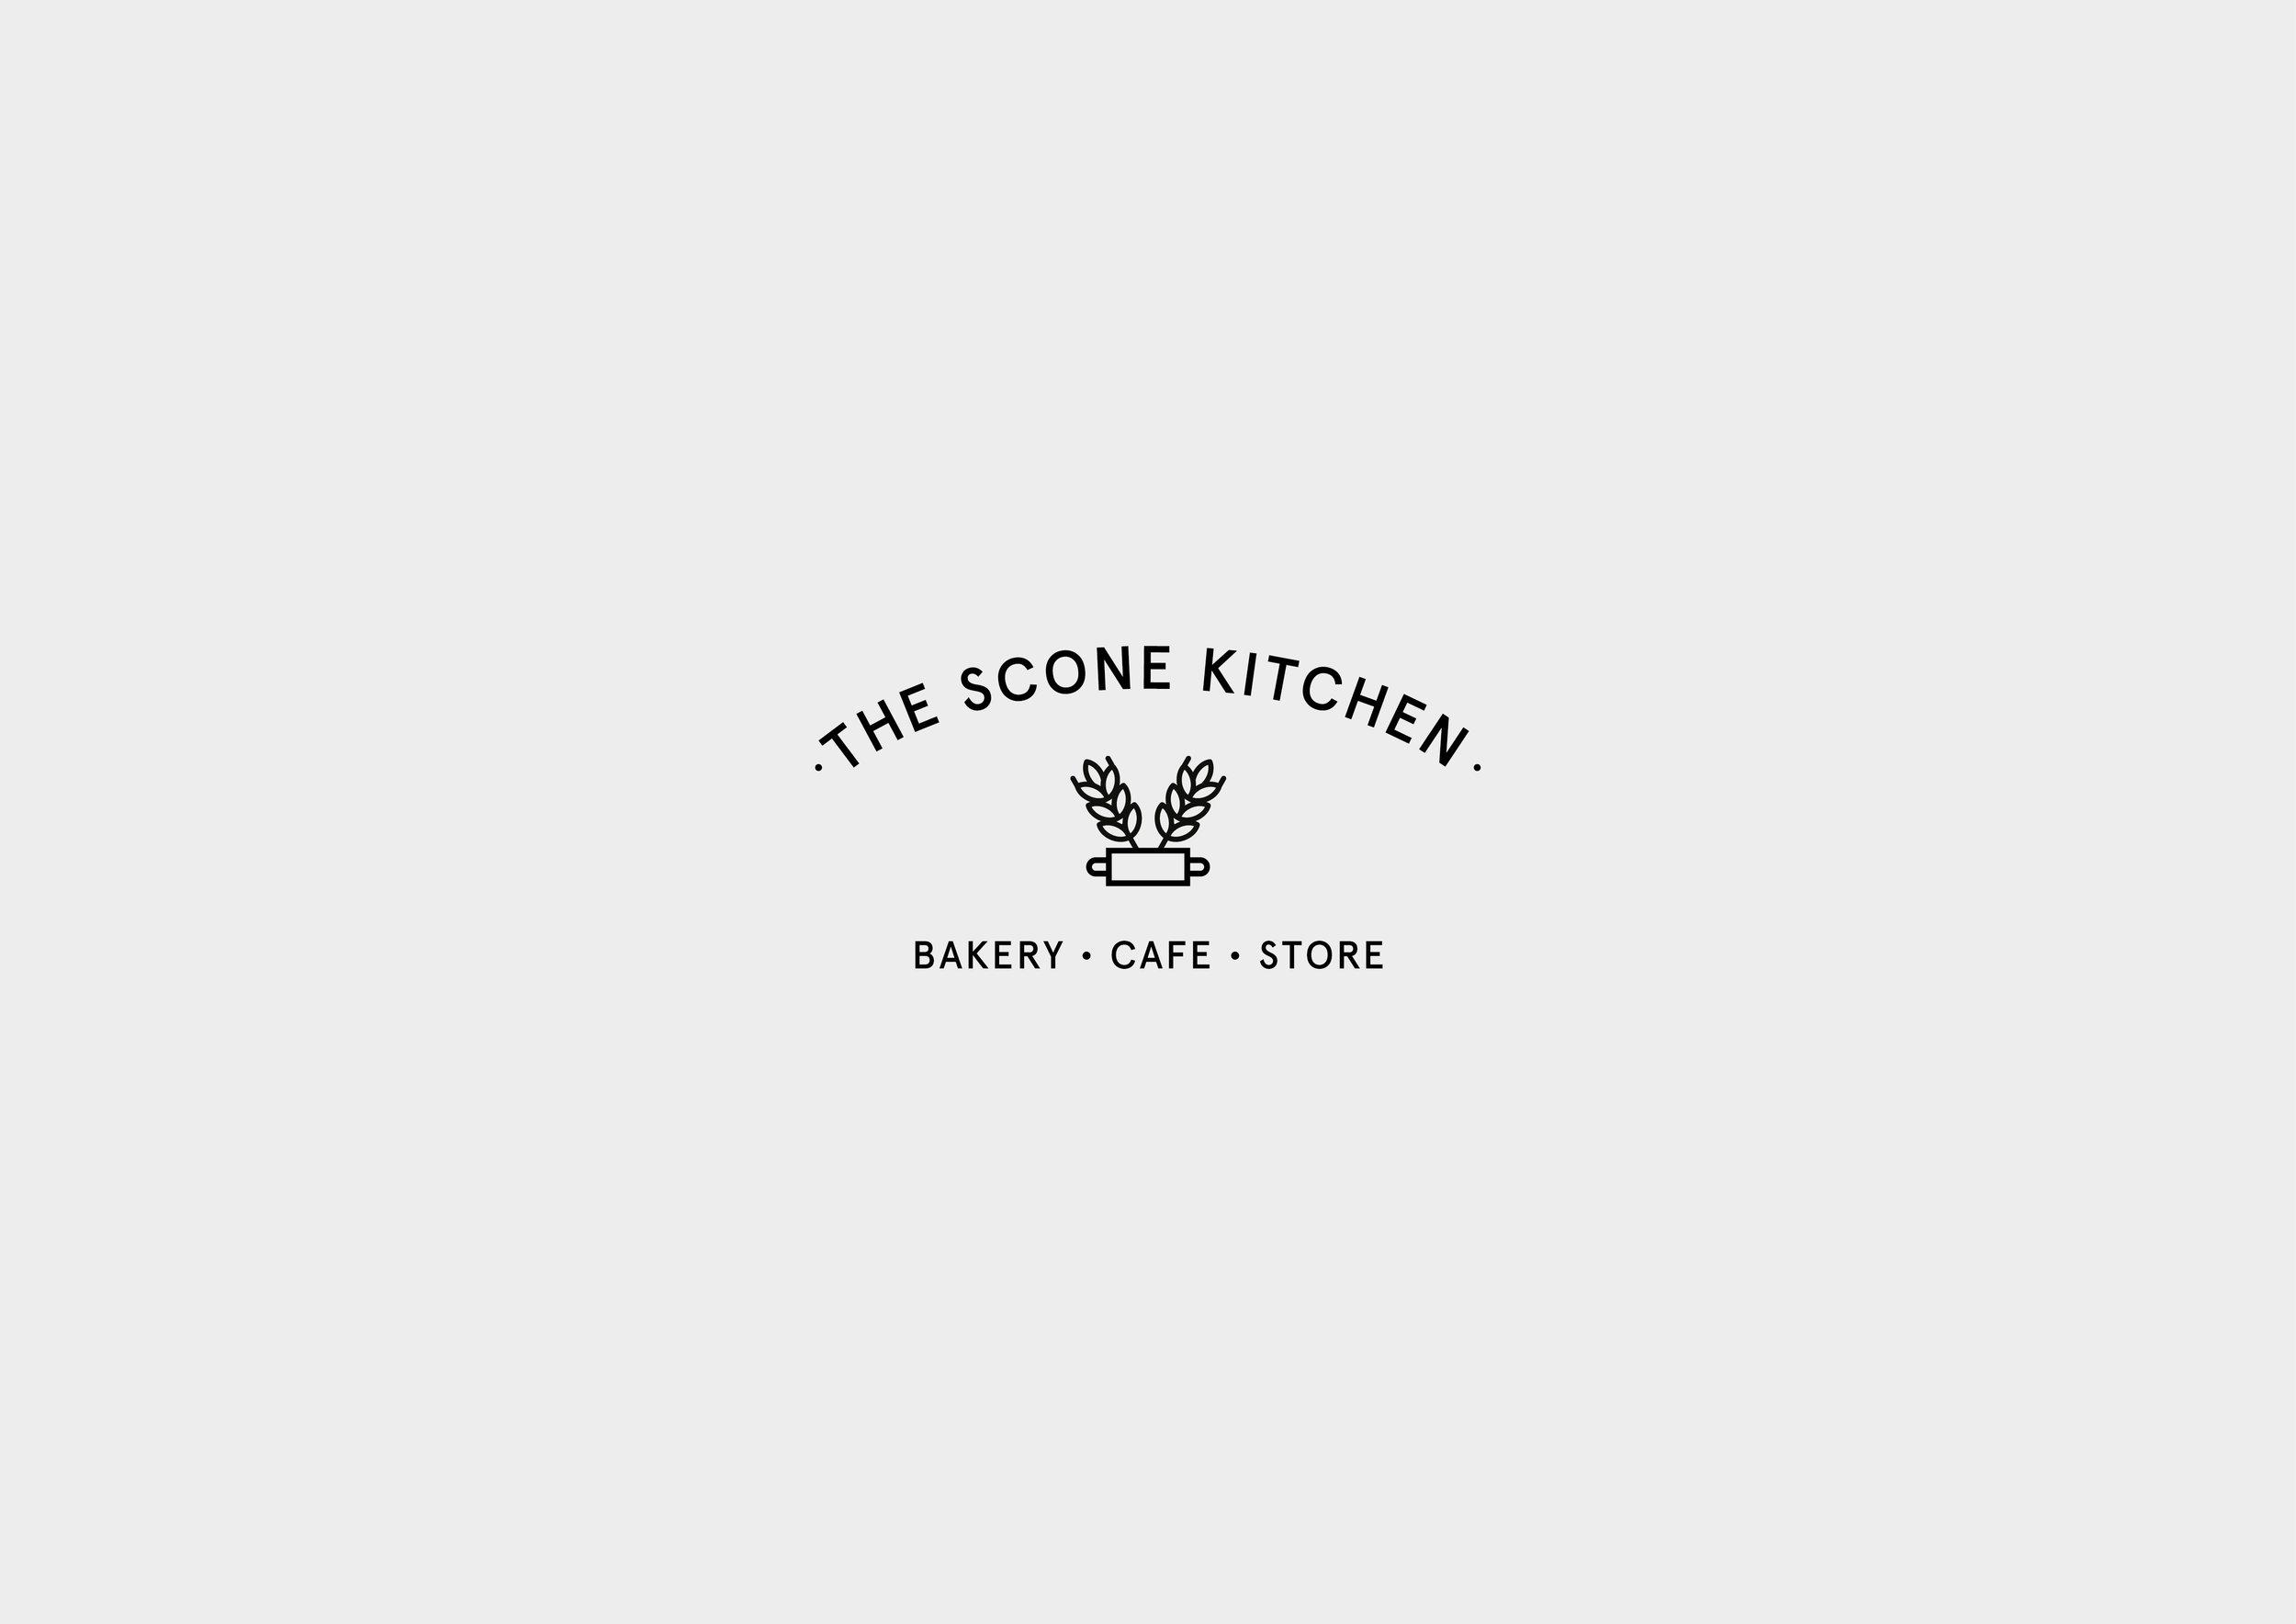 Scone kitchen mockup-01.jpg